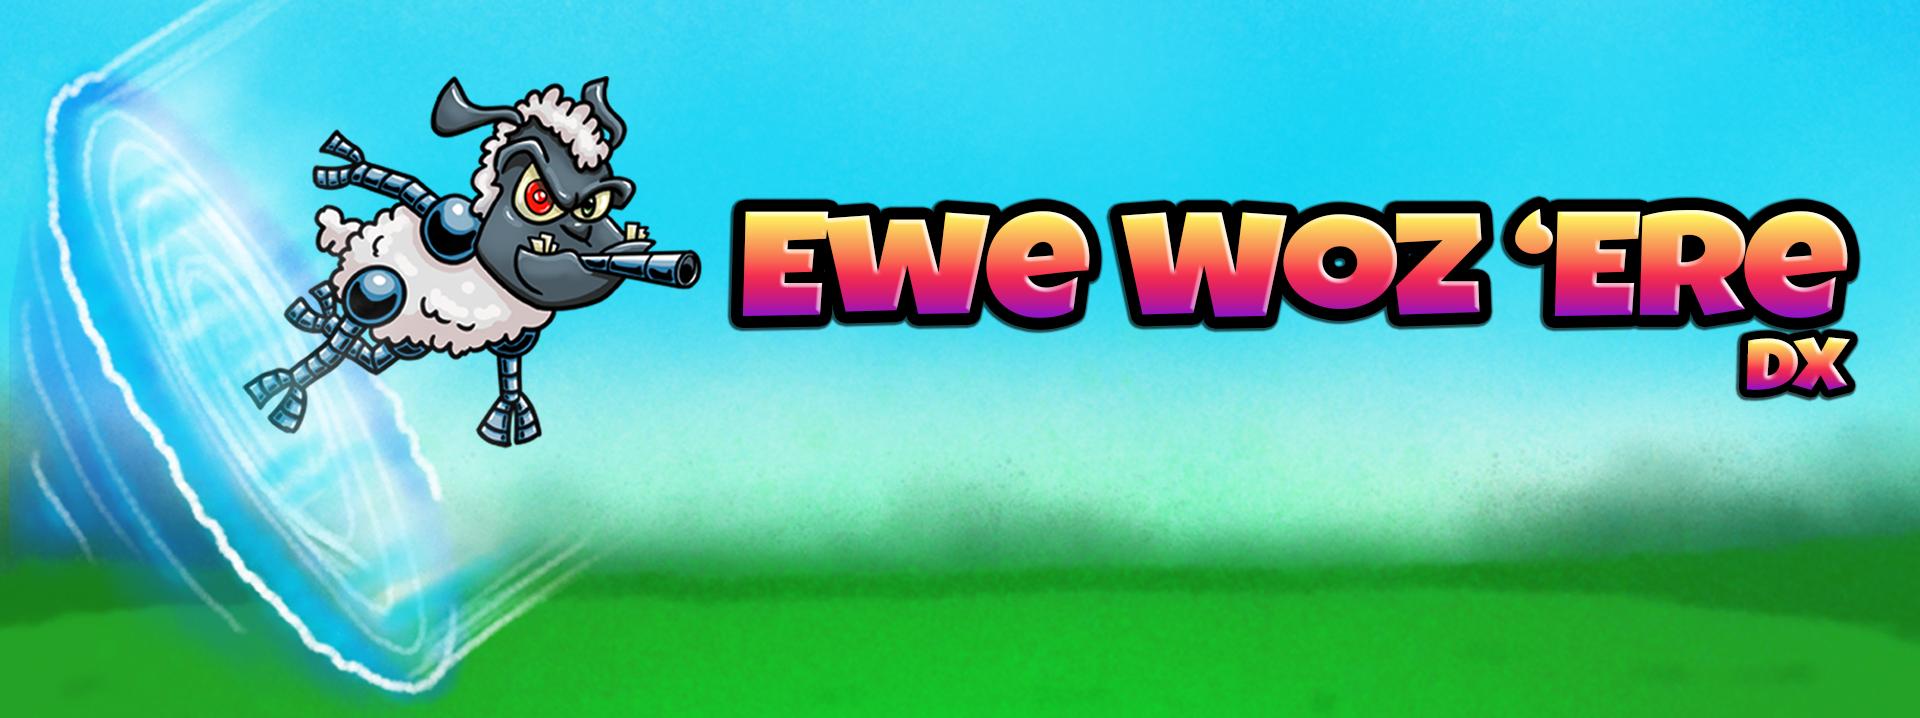 Ewe Woz 'Ere DX